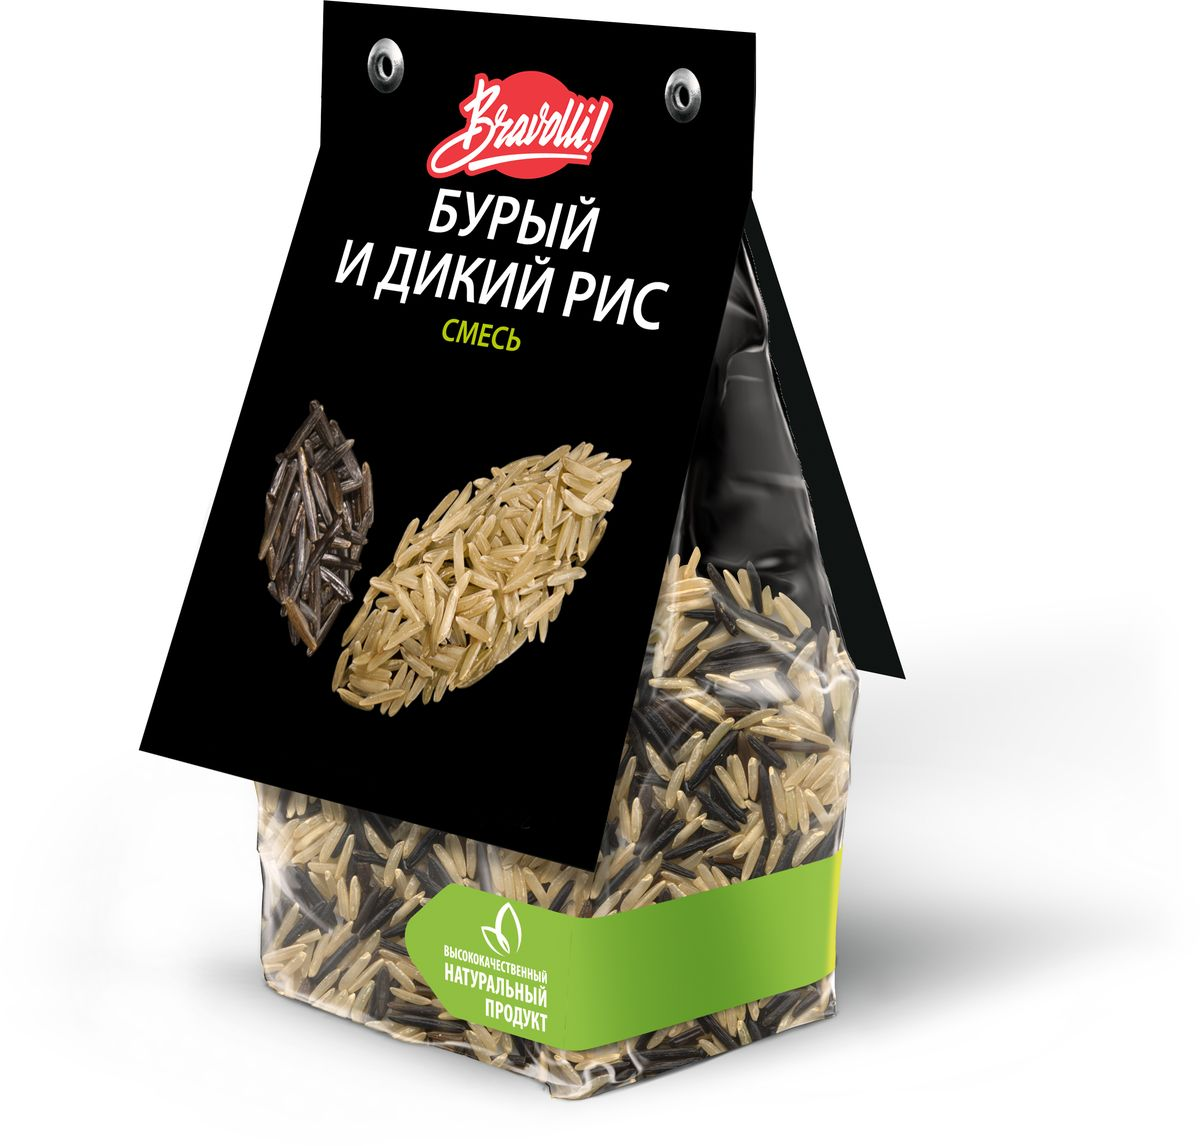 Bravolli Смесь бурый и дикий рис, 350 г bravolli жасмин рис 350 г